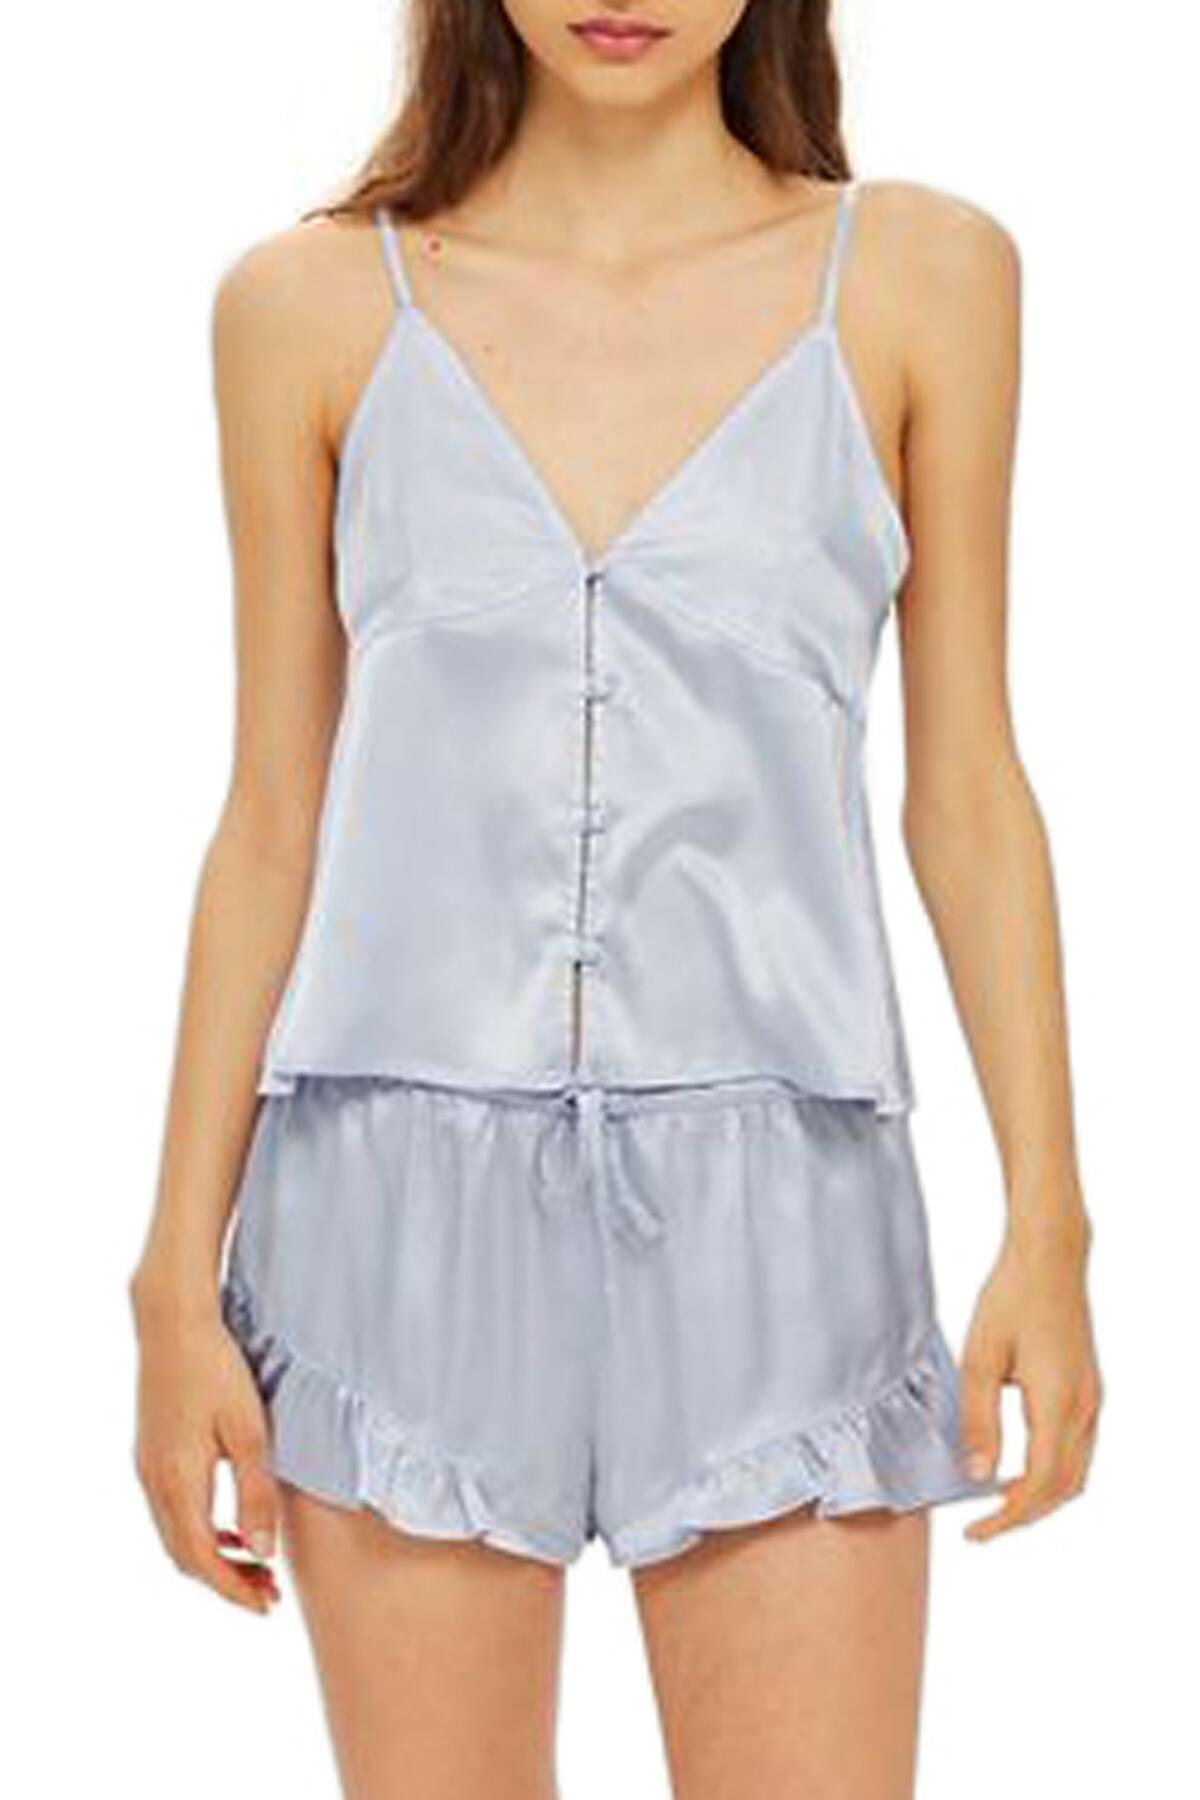 Lyst - TOPSHOP Lucina Satin Short Pajamas in Blue - Save 50.0% e955e83ca